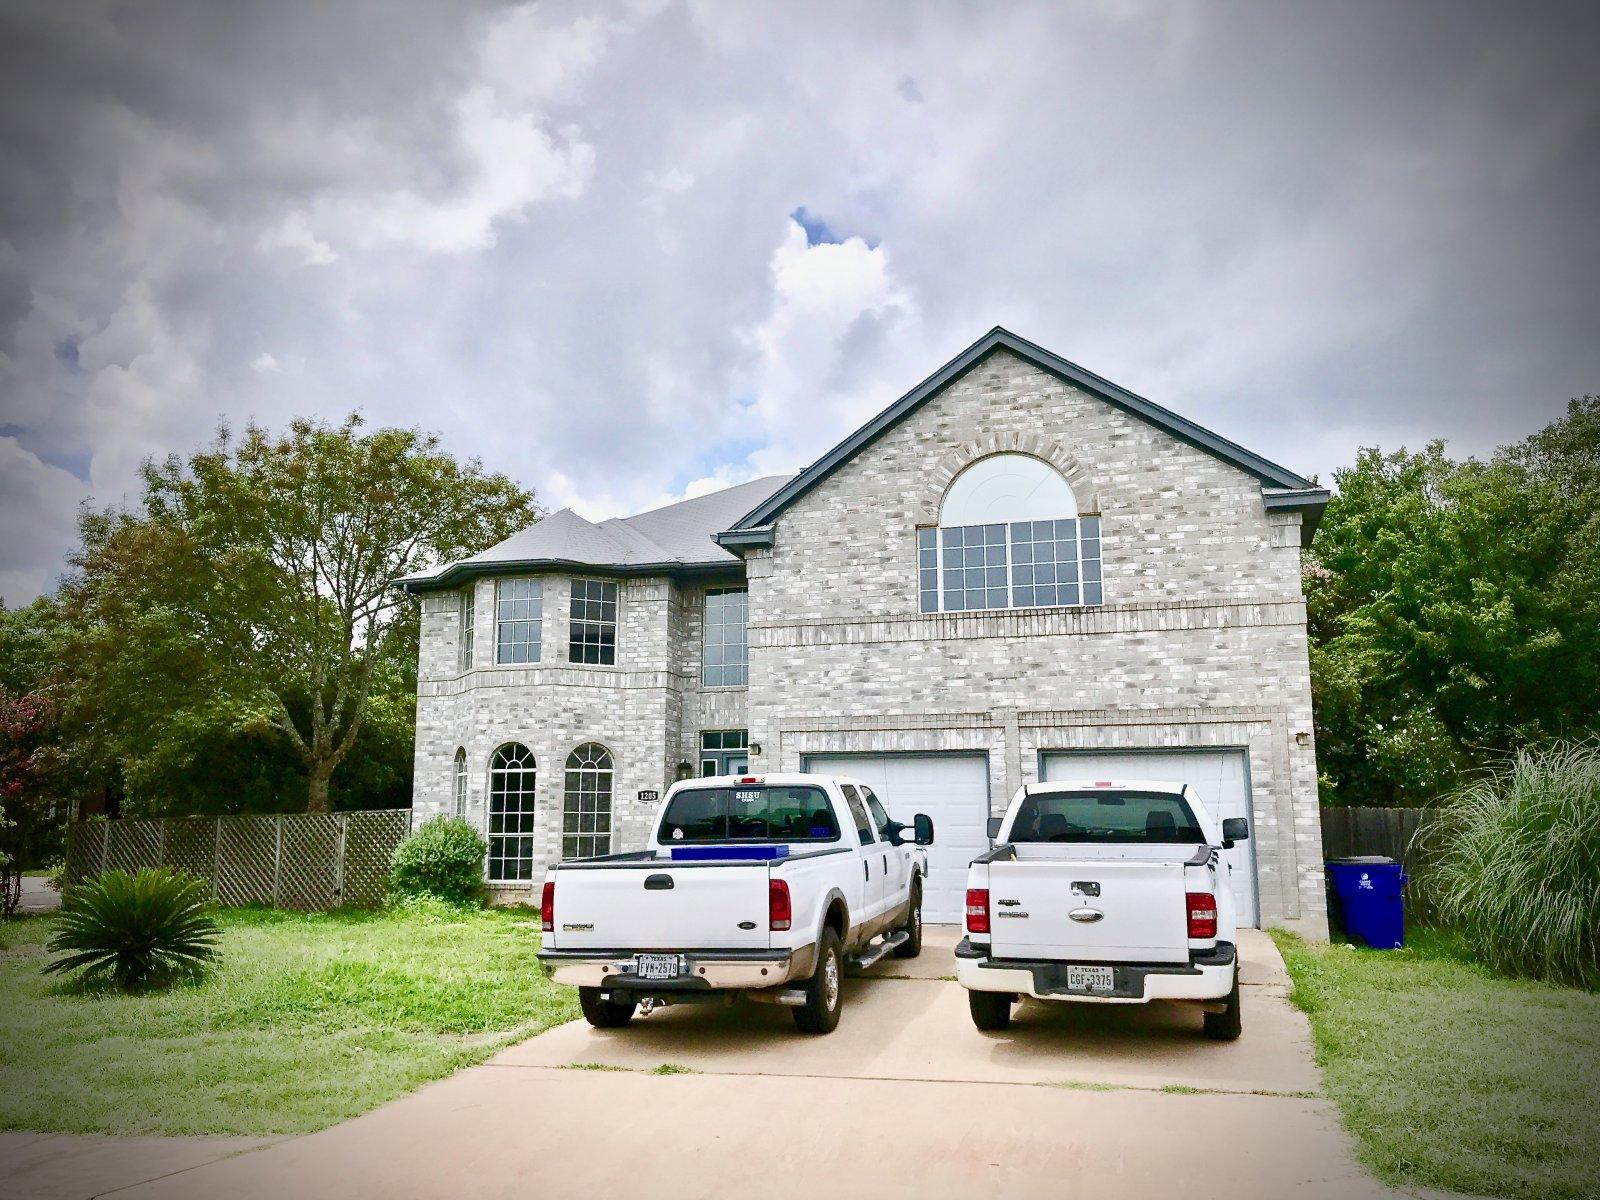 New-Cedar-Park-Home-For-Sale-Off-Market-Brick-2-Story-5-Bedroom-3-Bath